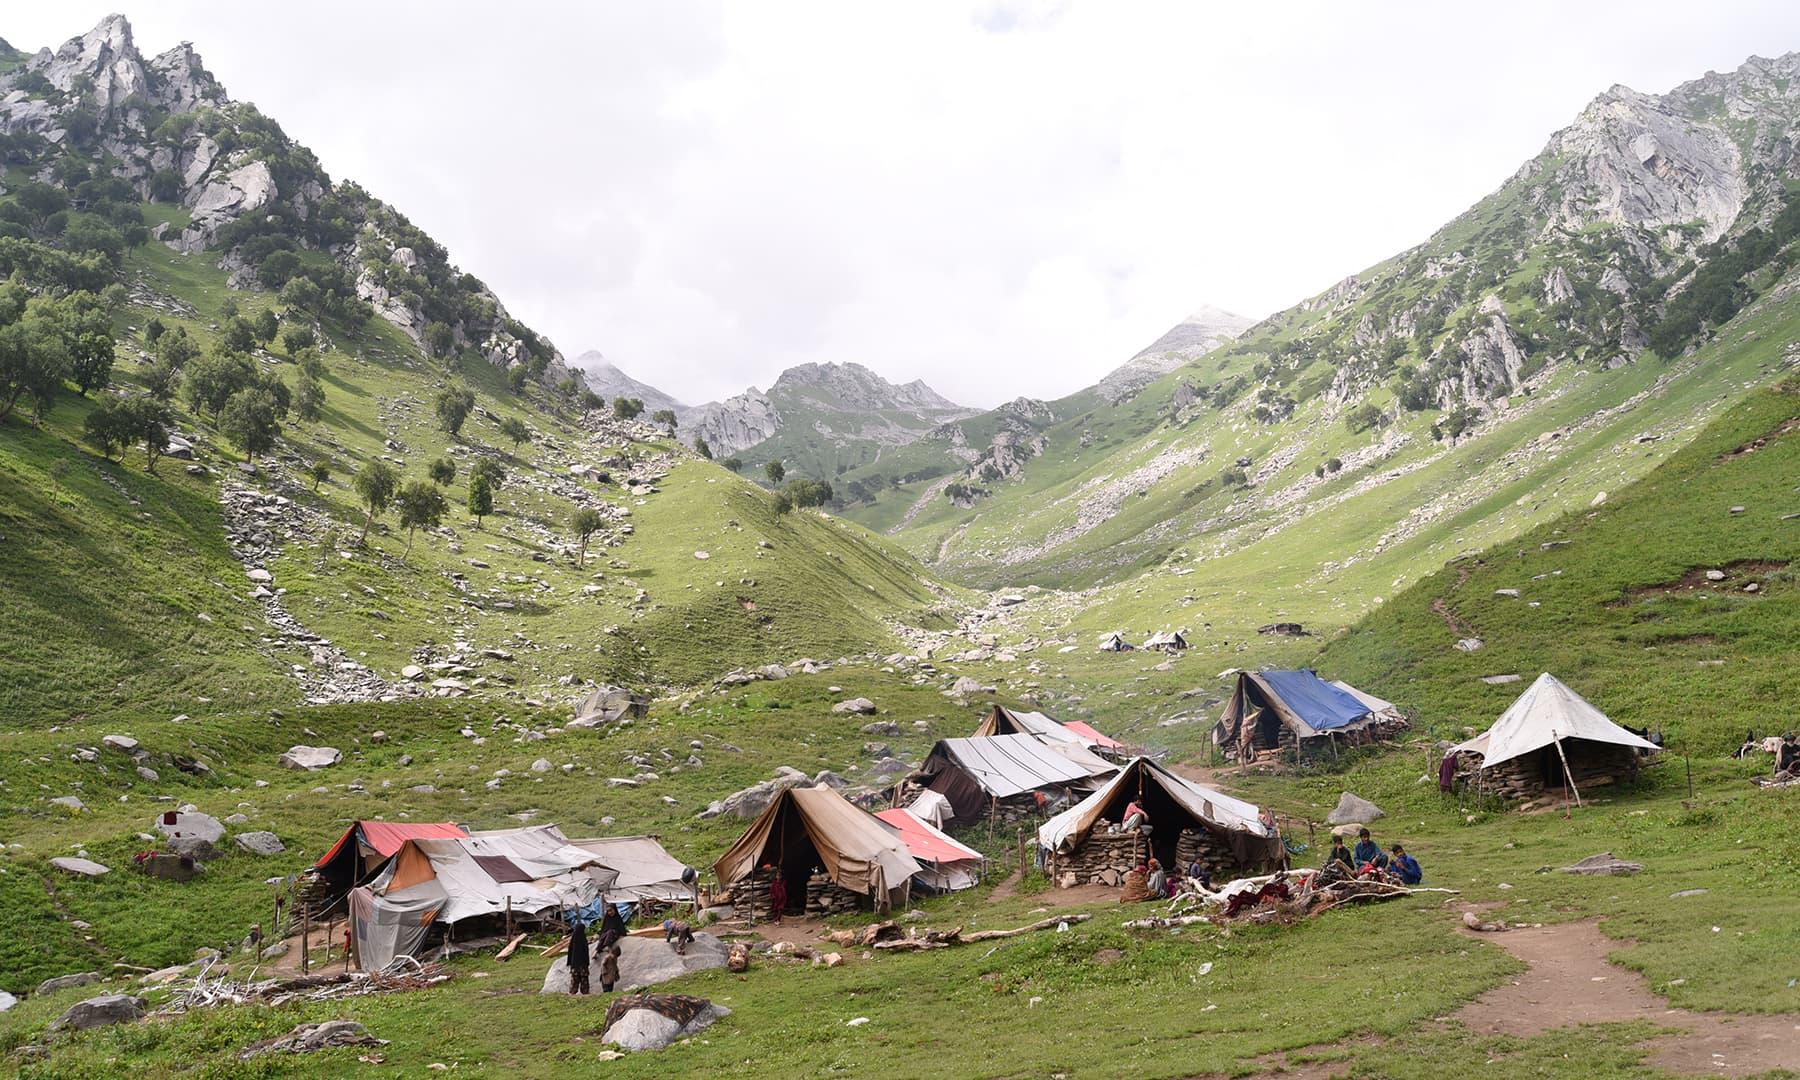 شکر گڑھ گاؤں—تصویر  سلمان خان